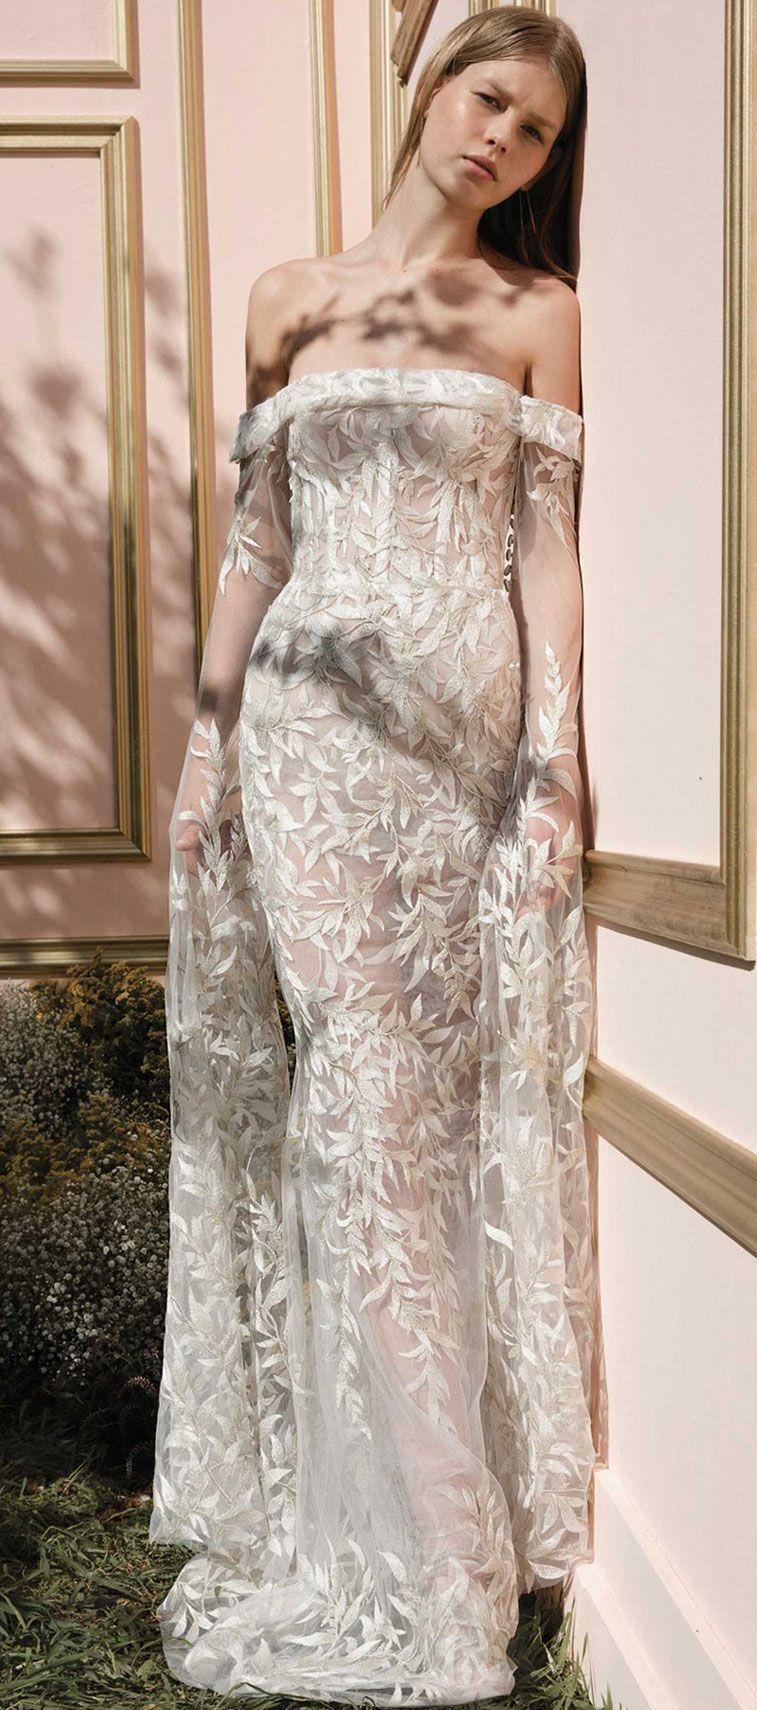 Dana harel secret garden bridal collection f gowns pinterest